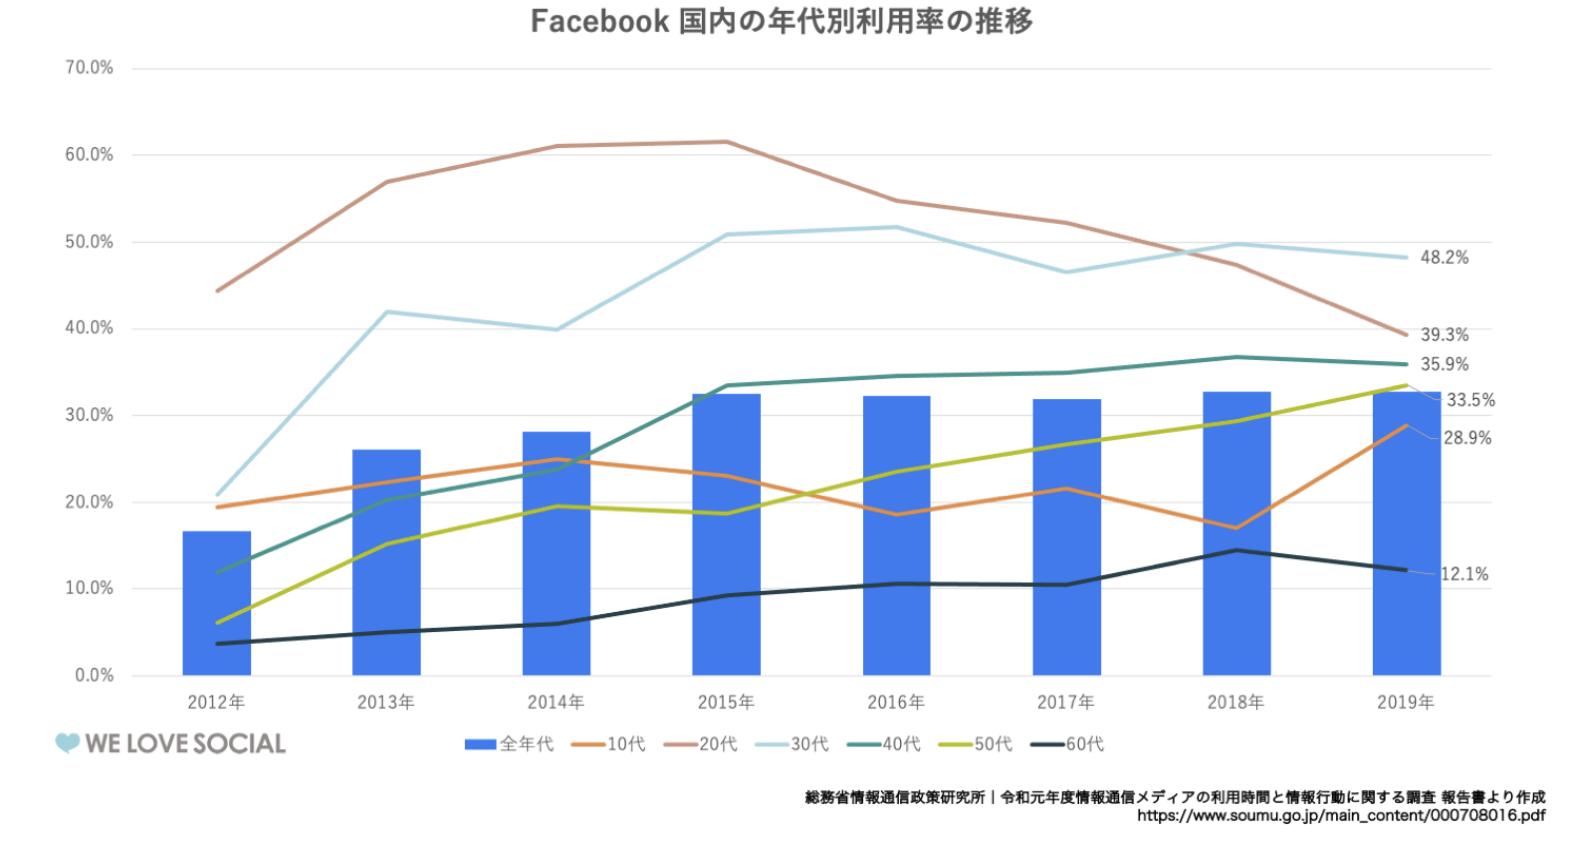 Facebookの国内の年代別利用率